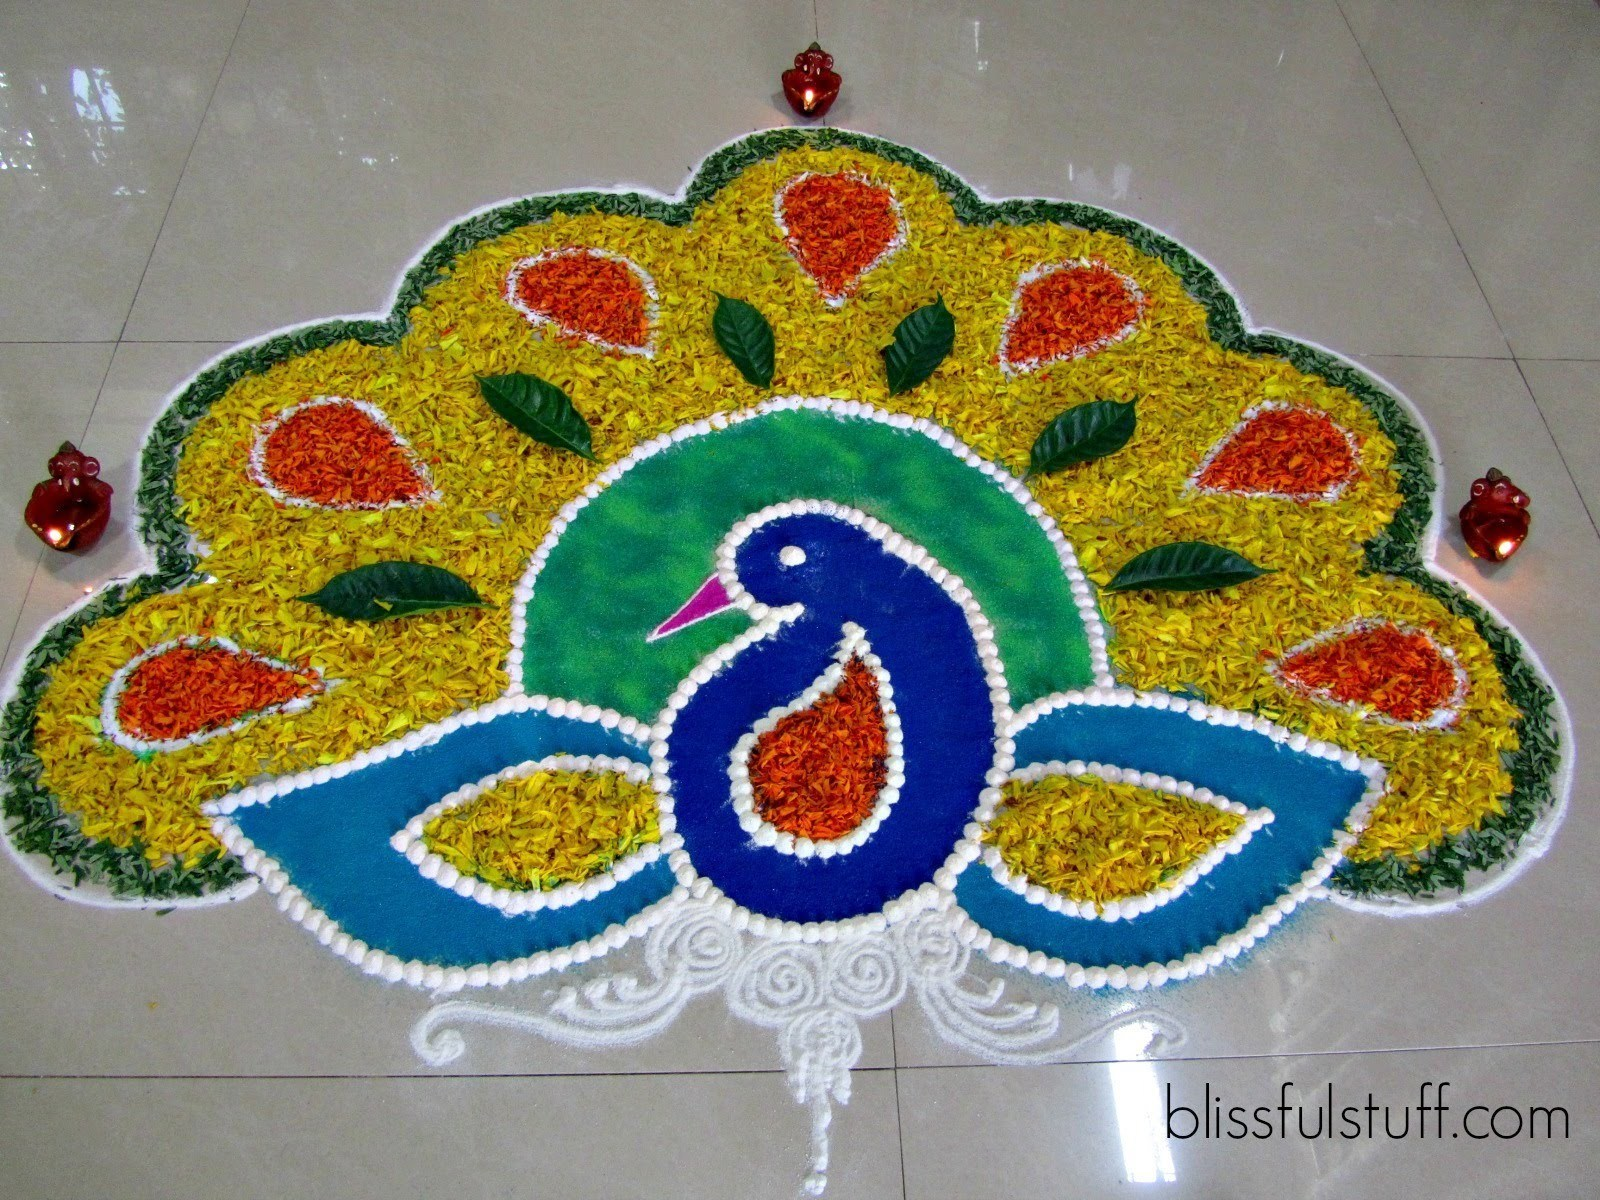 Peacock Rangoli Design for Deepavali